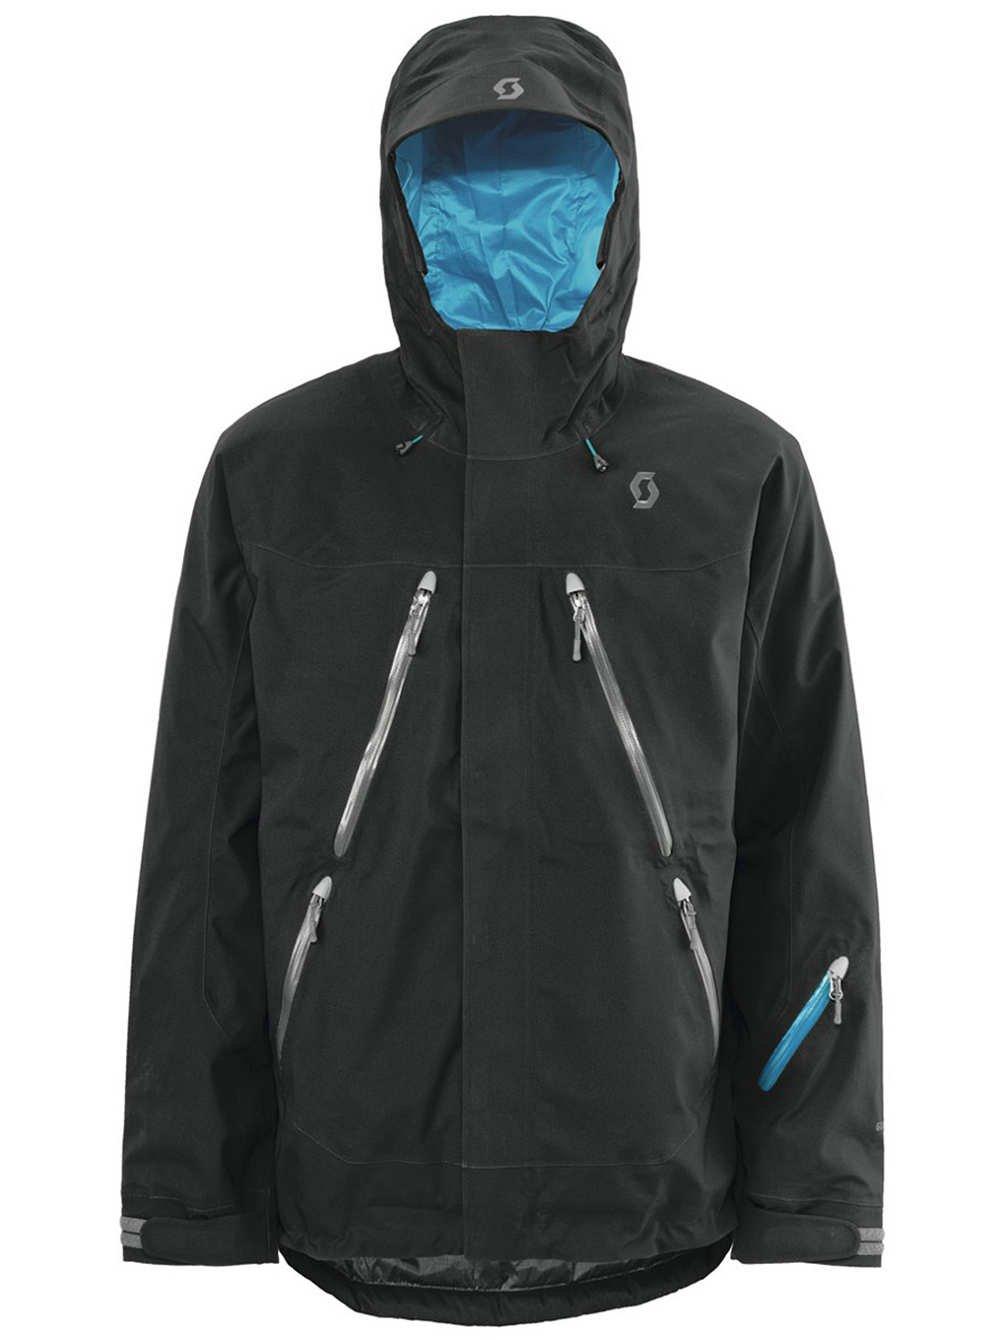 Herren Snowboard Jacke Scott Lombardo Jacket jetzt bestellen